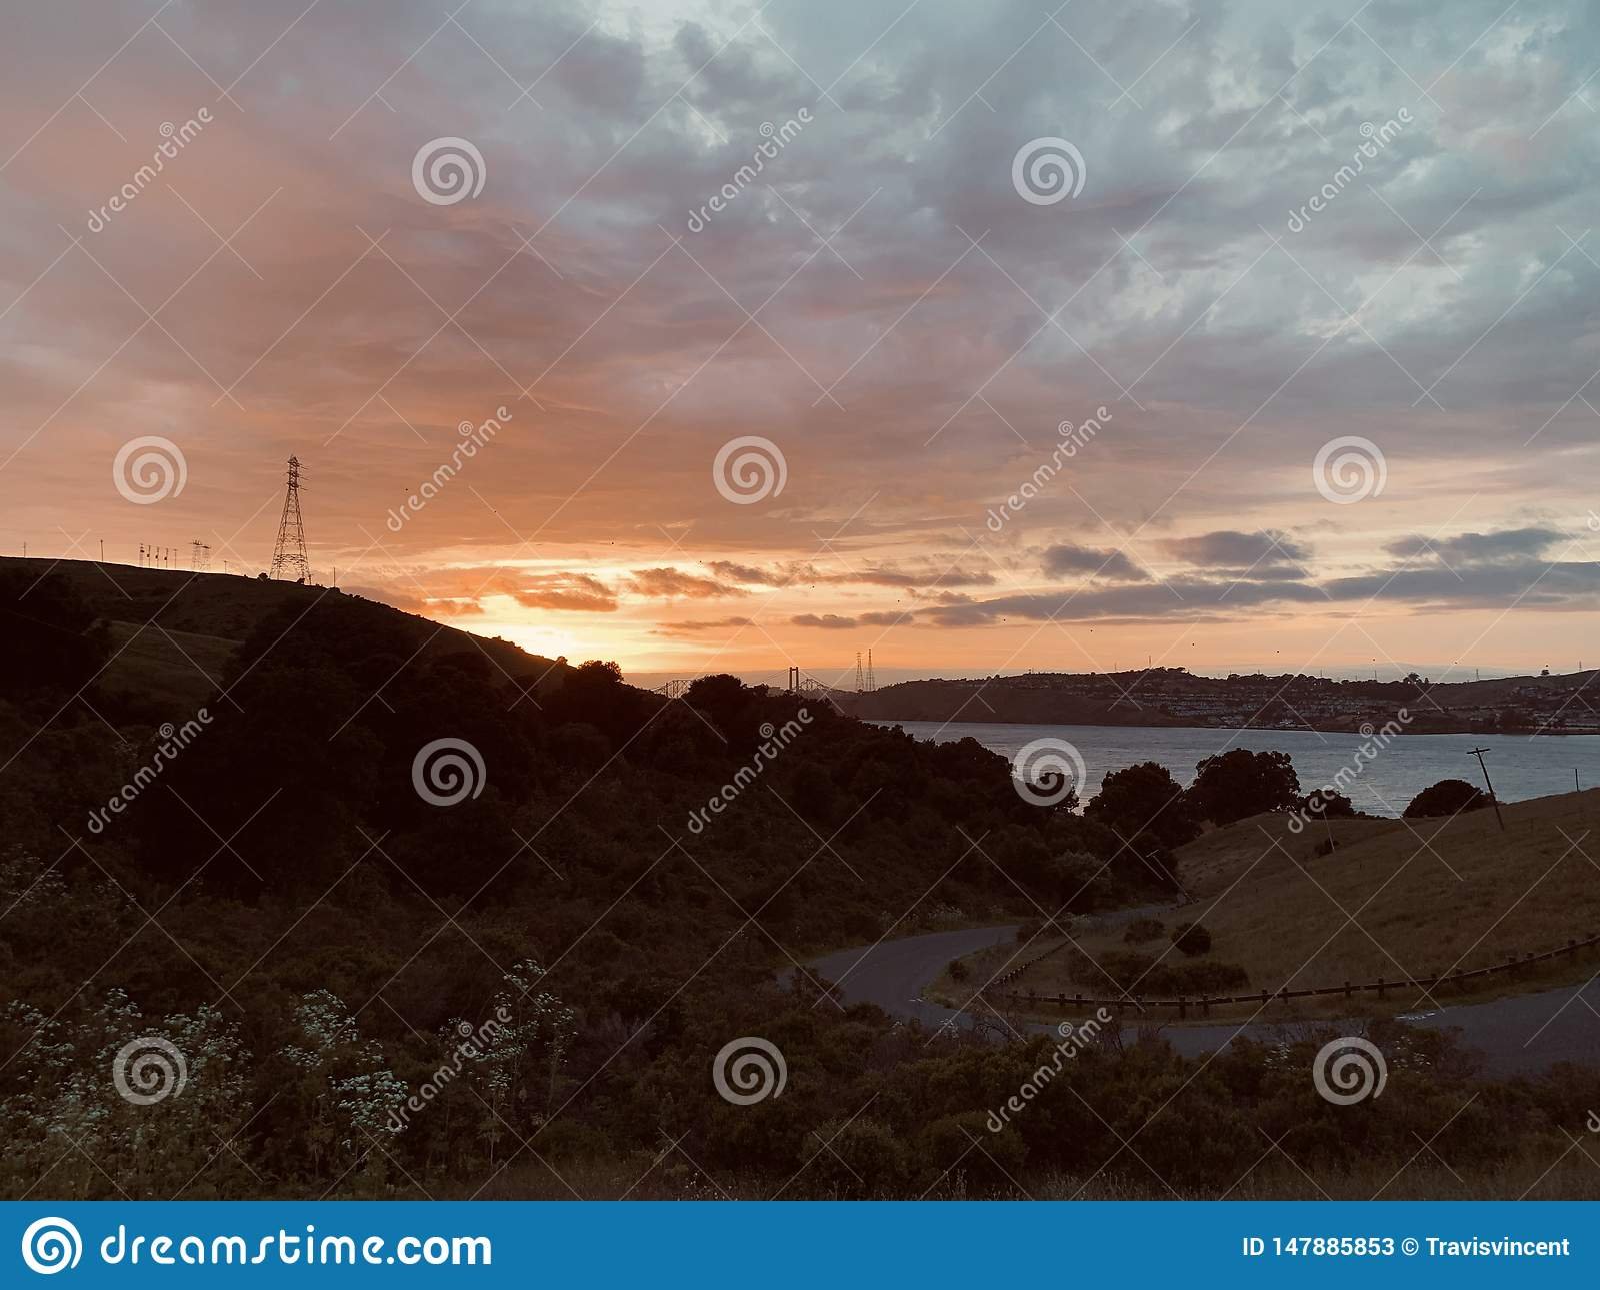 Sunset over Carquinez Strait